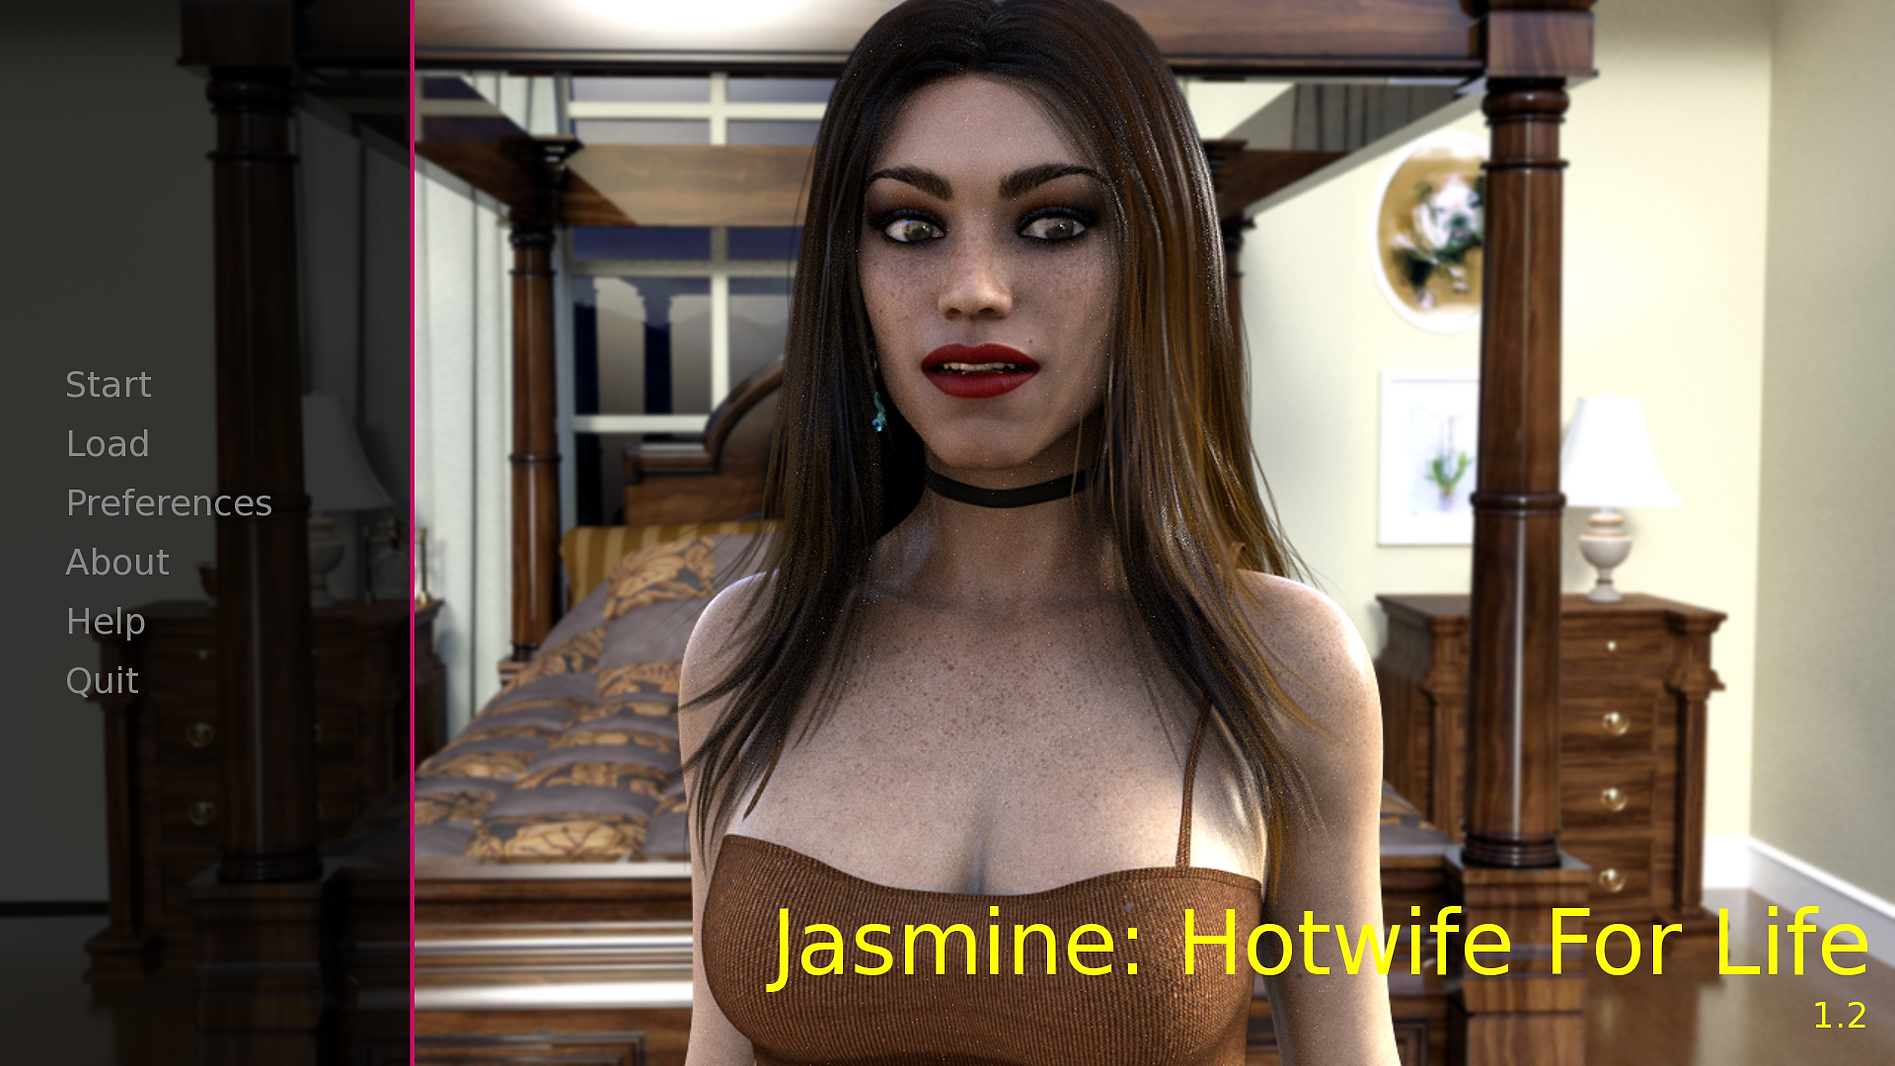 Jasmine Hotwife For Life main - Haru's H